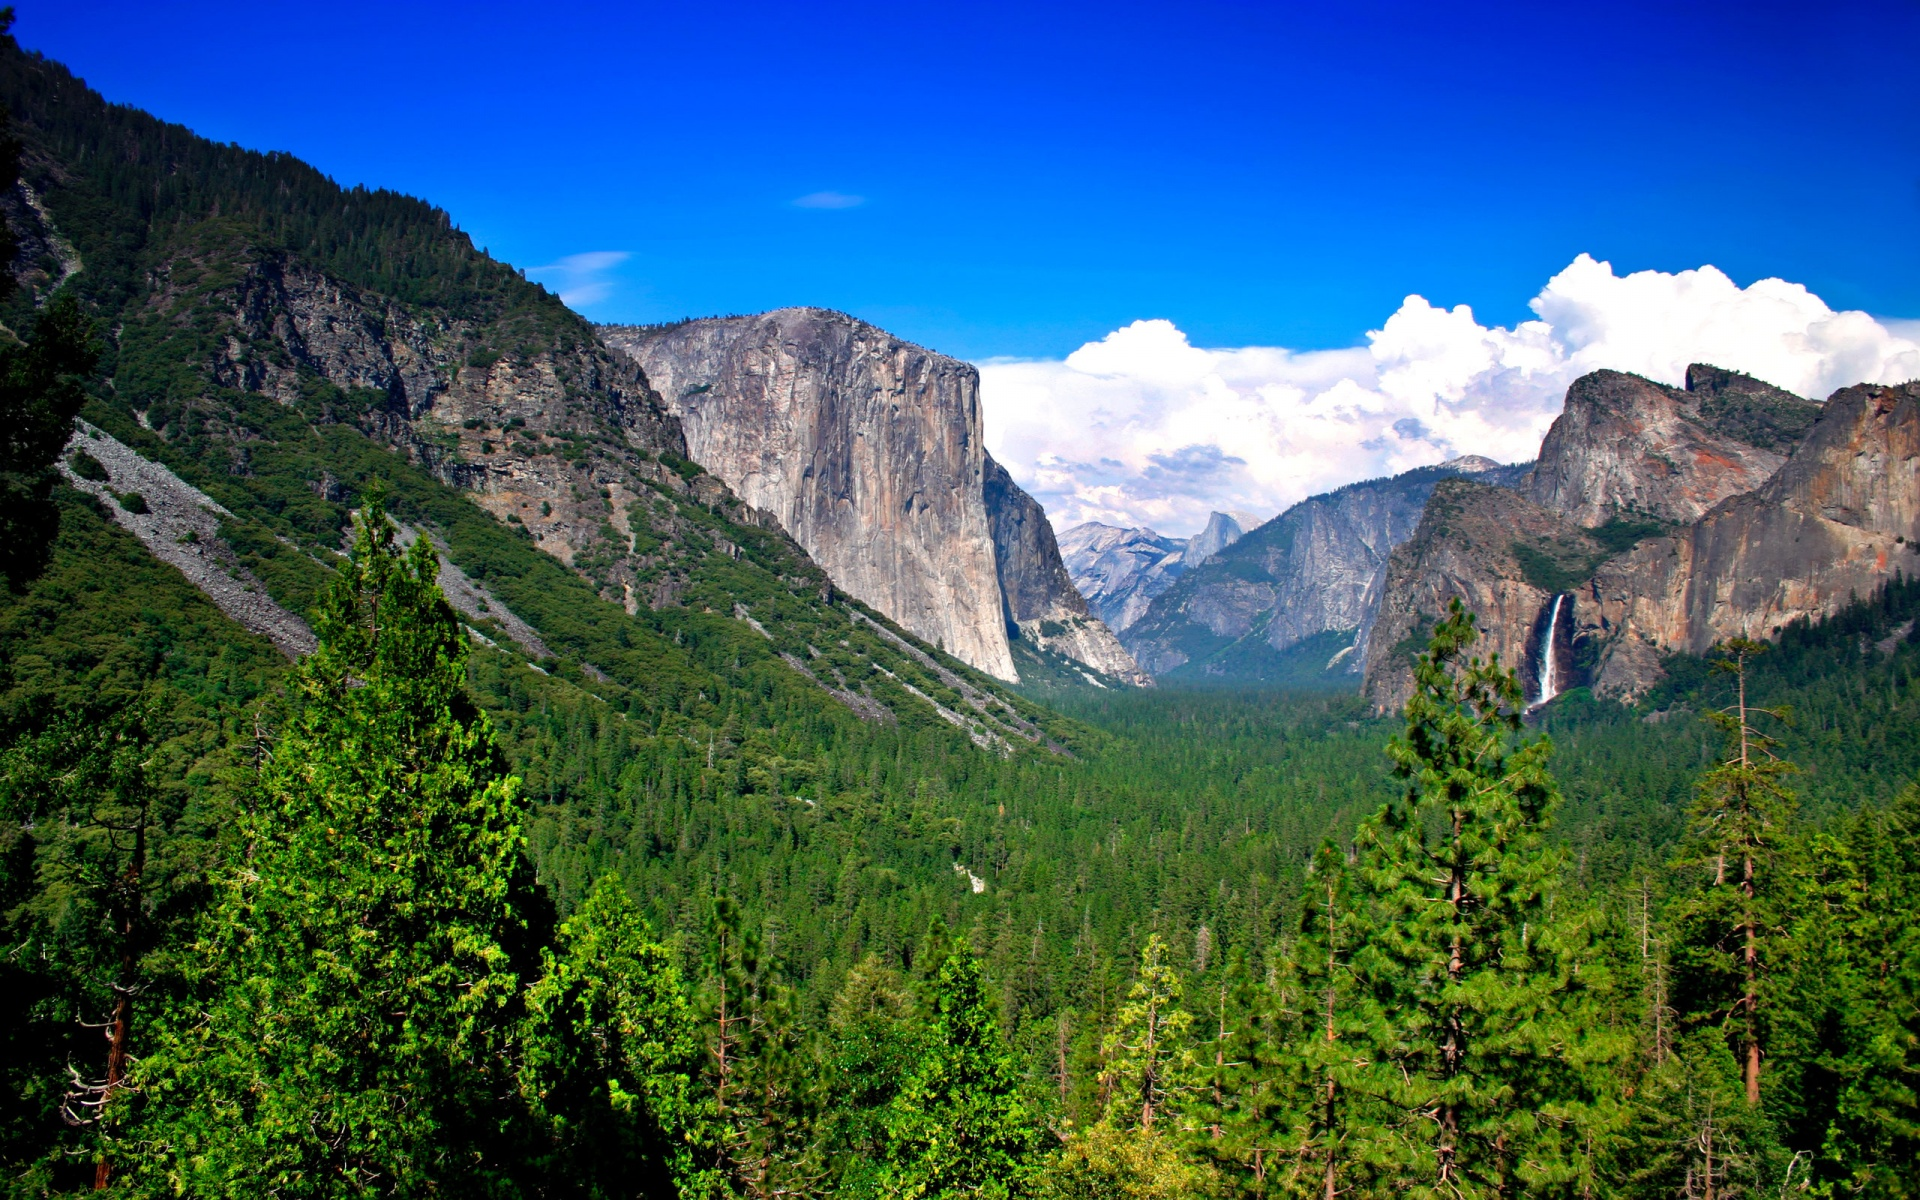 Download Windows 8 Background Yosemite Mountains Windows 8 Wallpaper 1920x1200